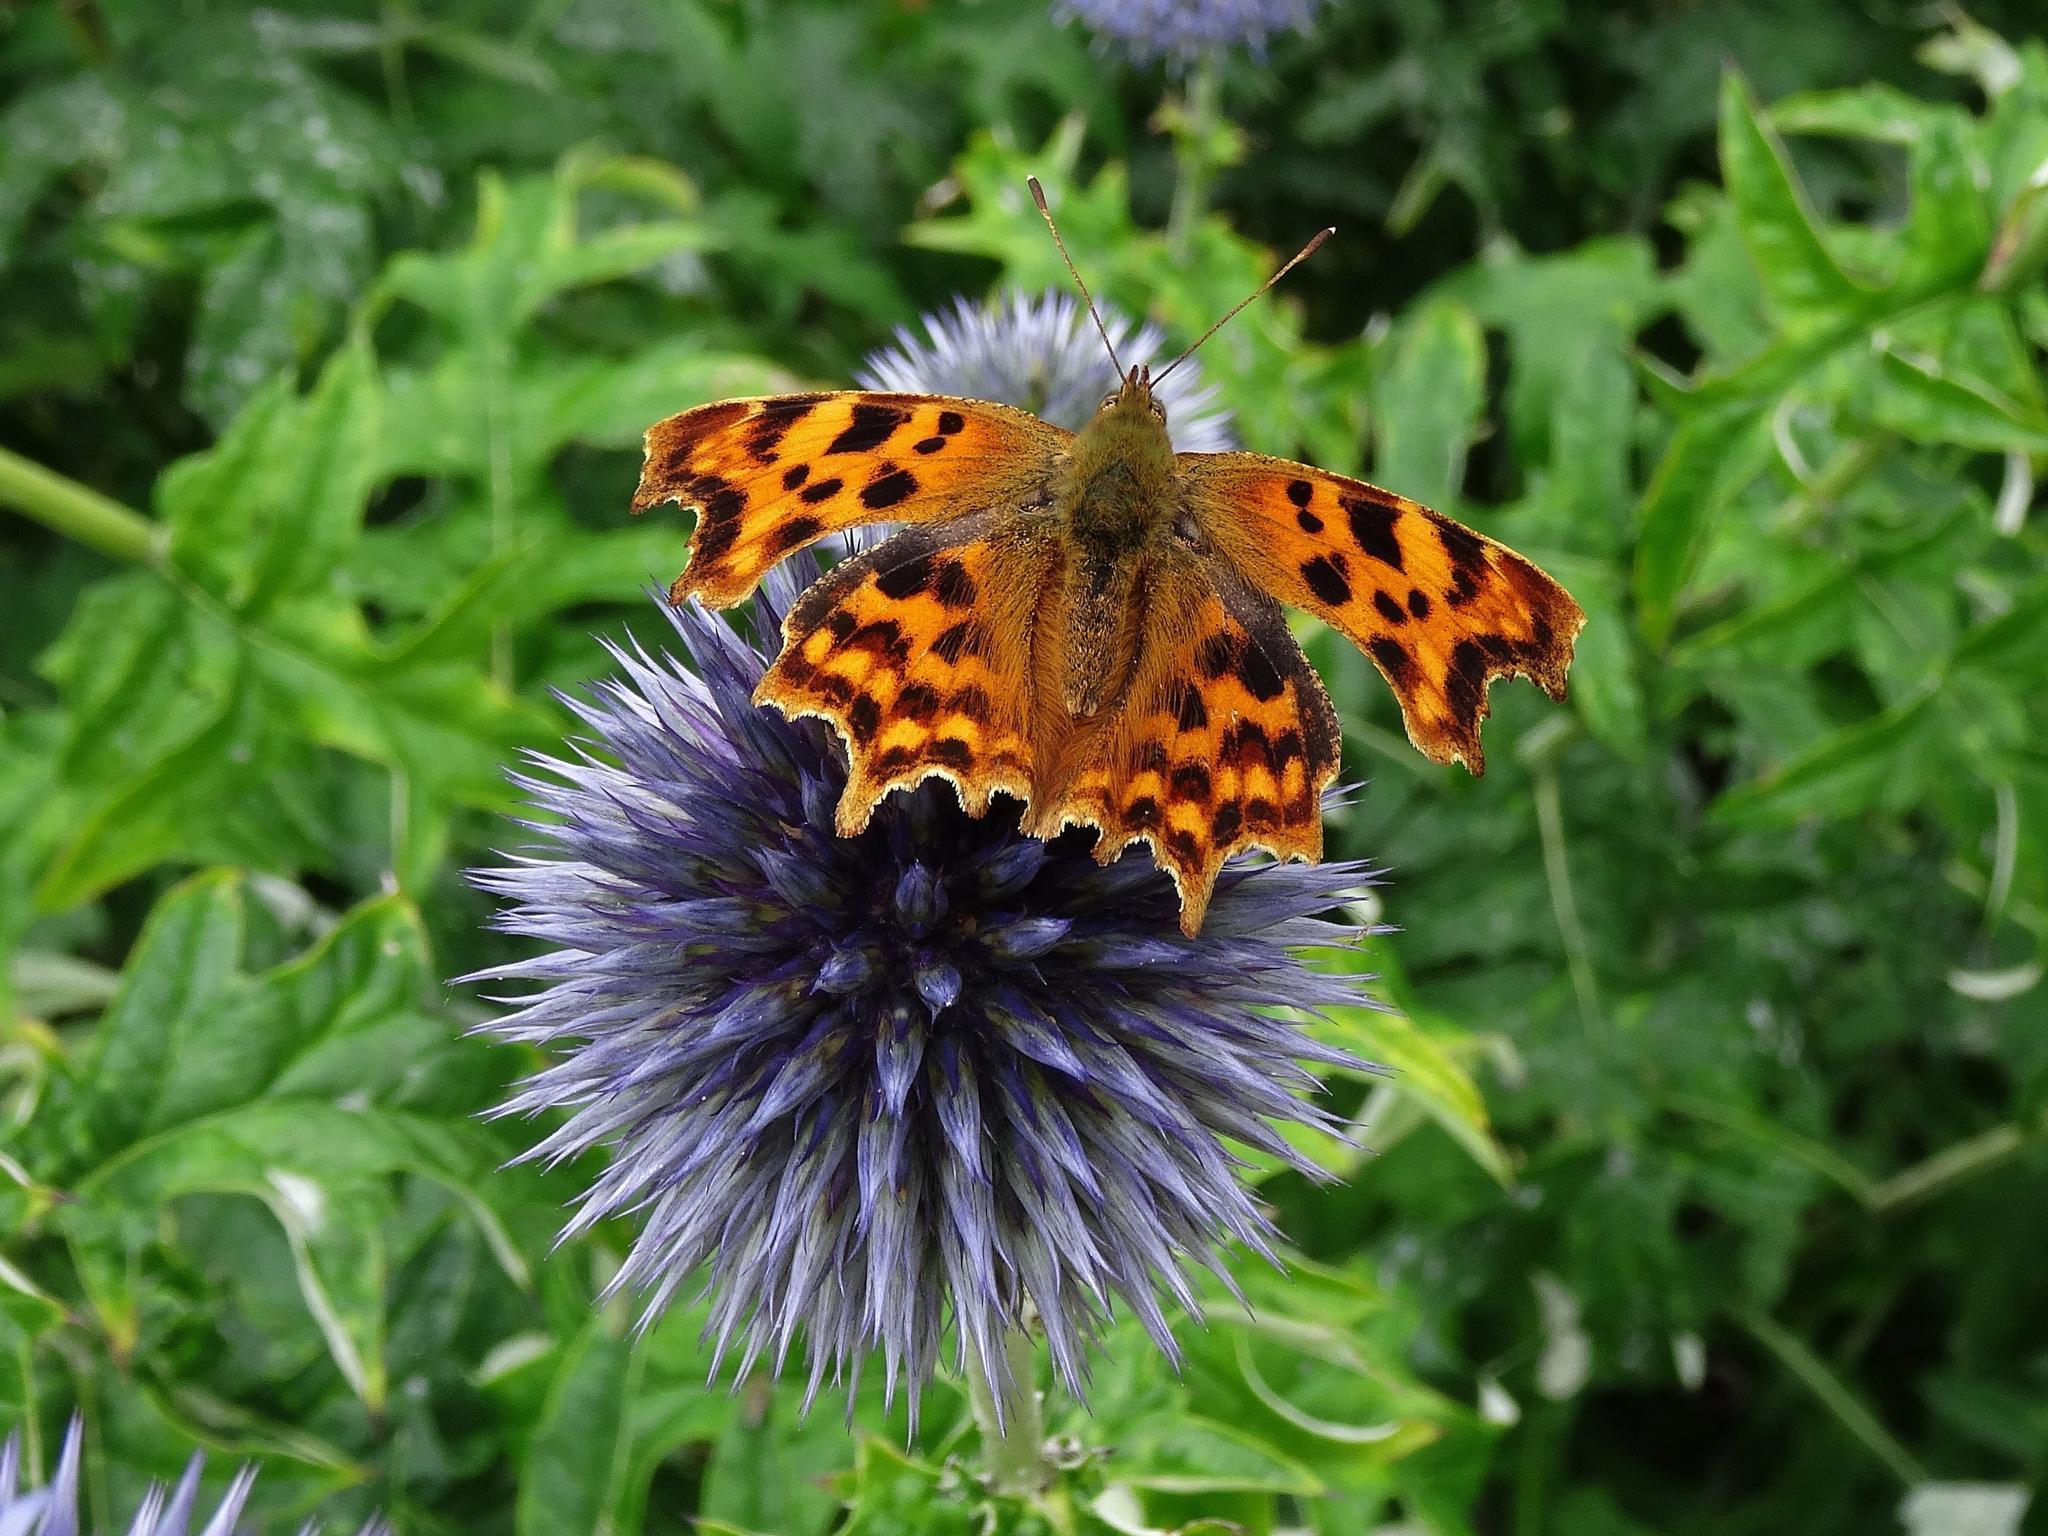 Comma butterfly by elizabeth.cooksey.3